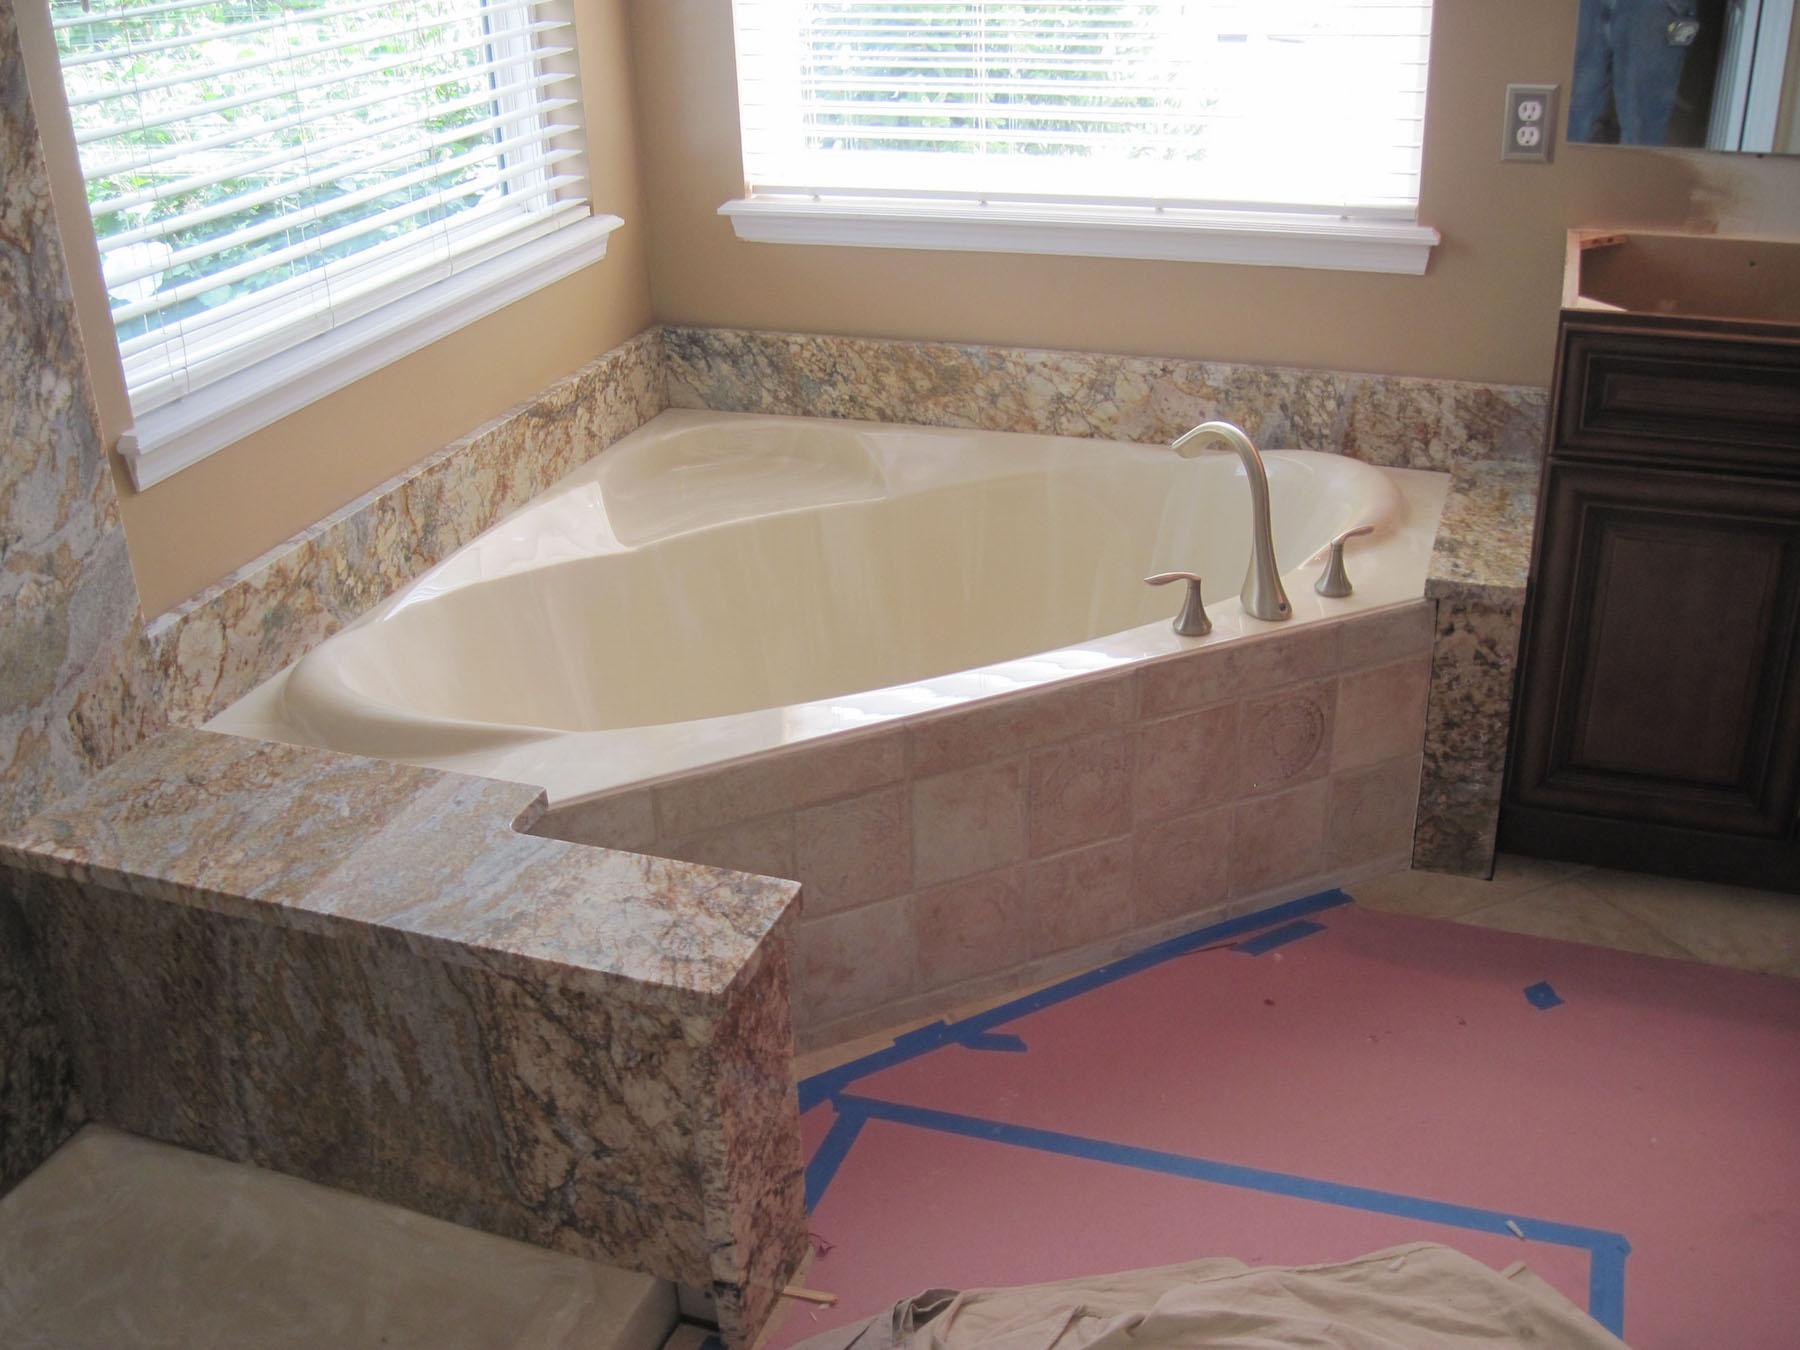 Sensational Granite Bathroom Gallery Vanity Countertop Slab St Download Free Architecture Designs Sospemadebymaigaardcom